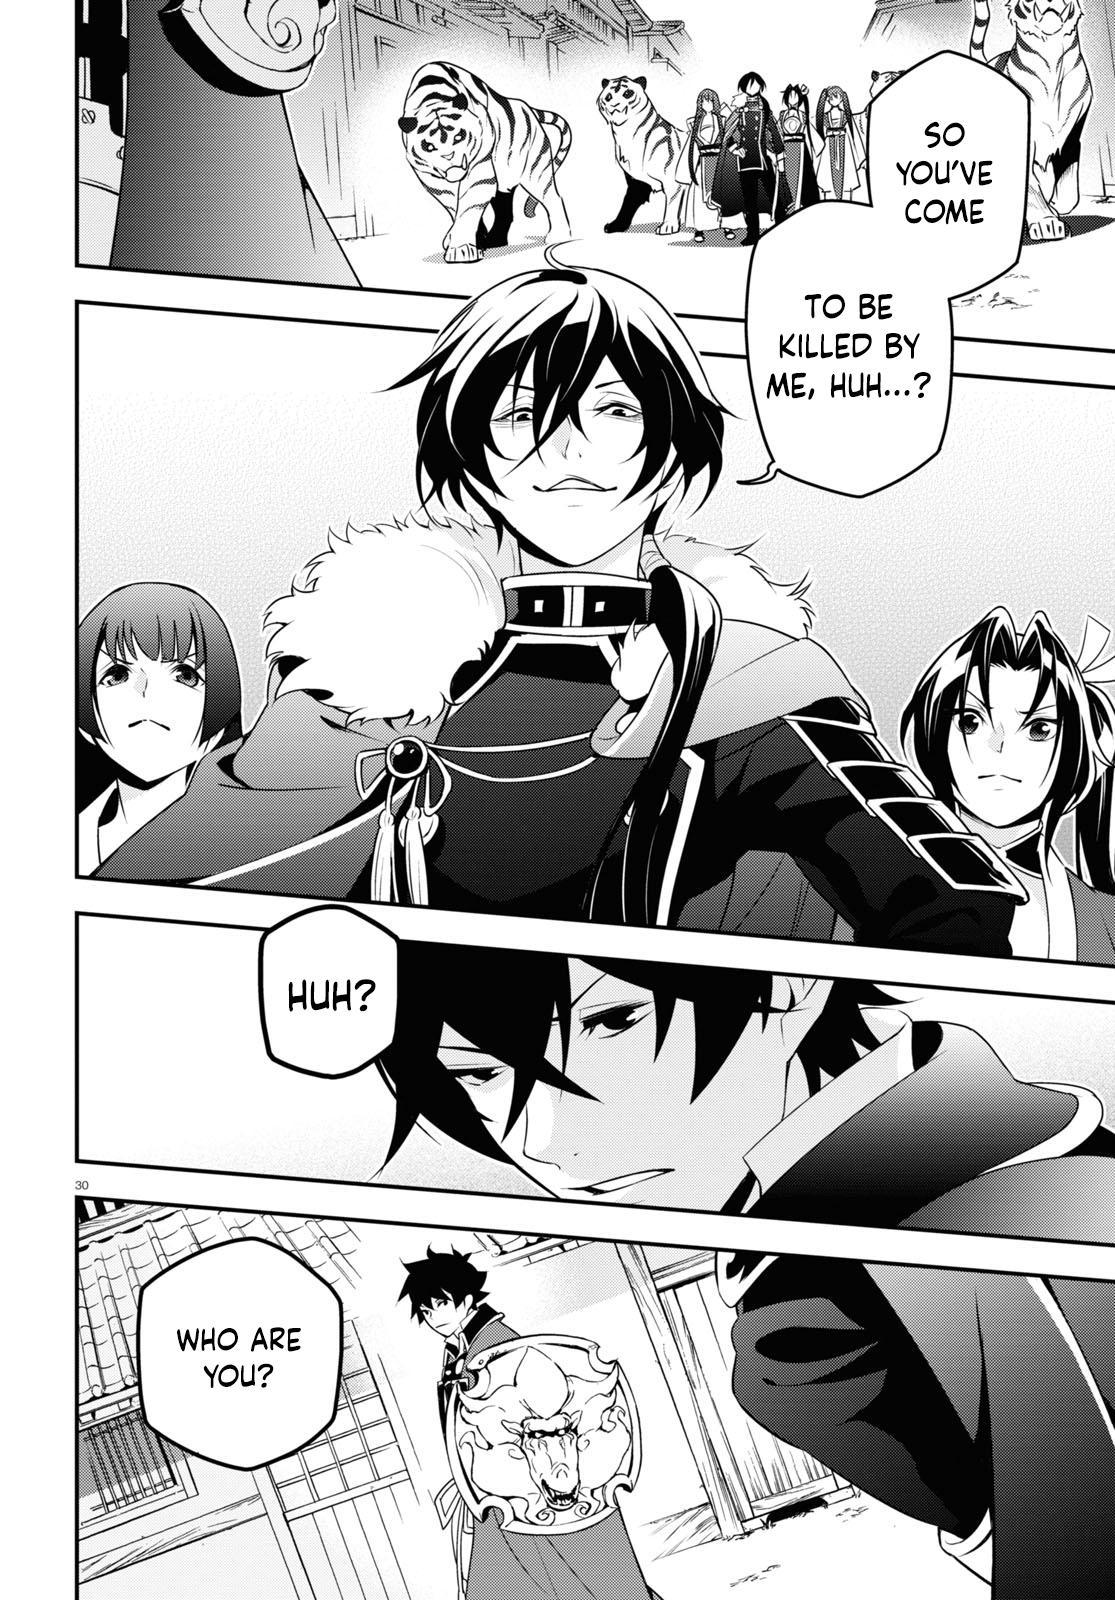 Tate no Yuusha no Nariagari, Chapter 73 image 030